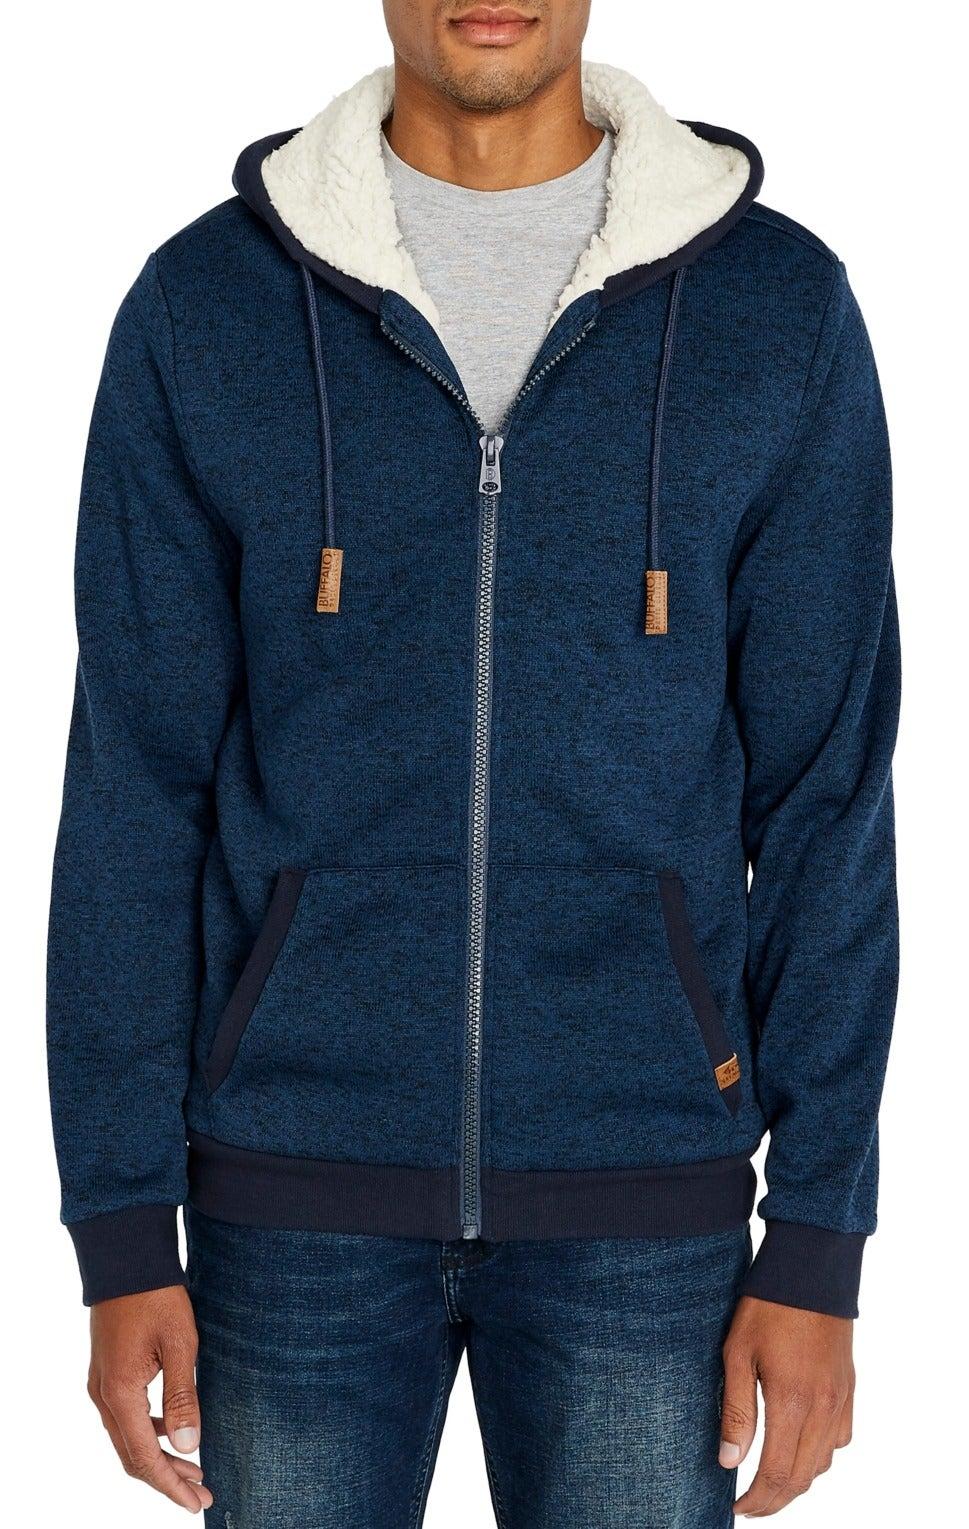 Buffalo David Bitton Mens Sweater Blue Size Large L Hooded Sherpa Zip